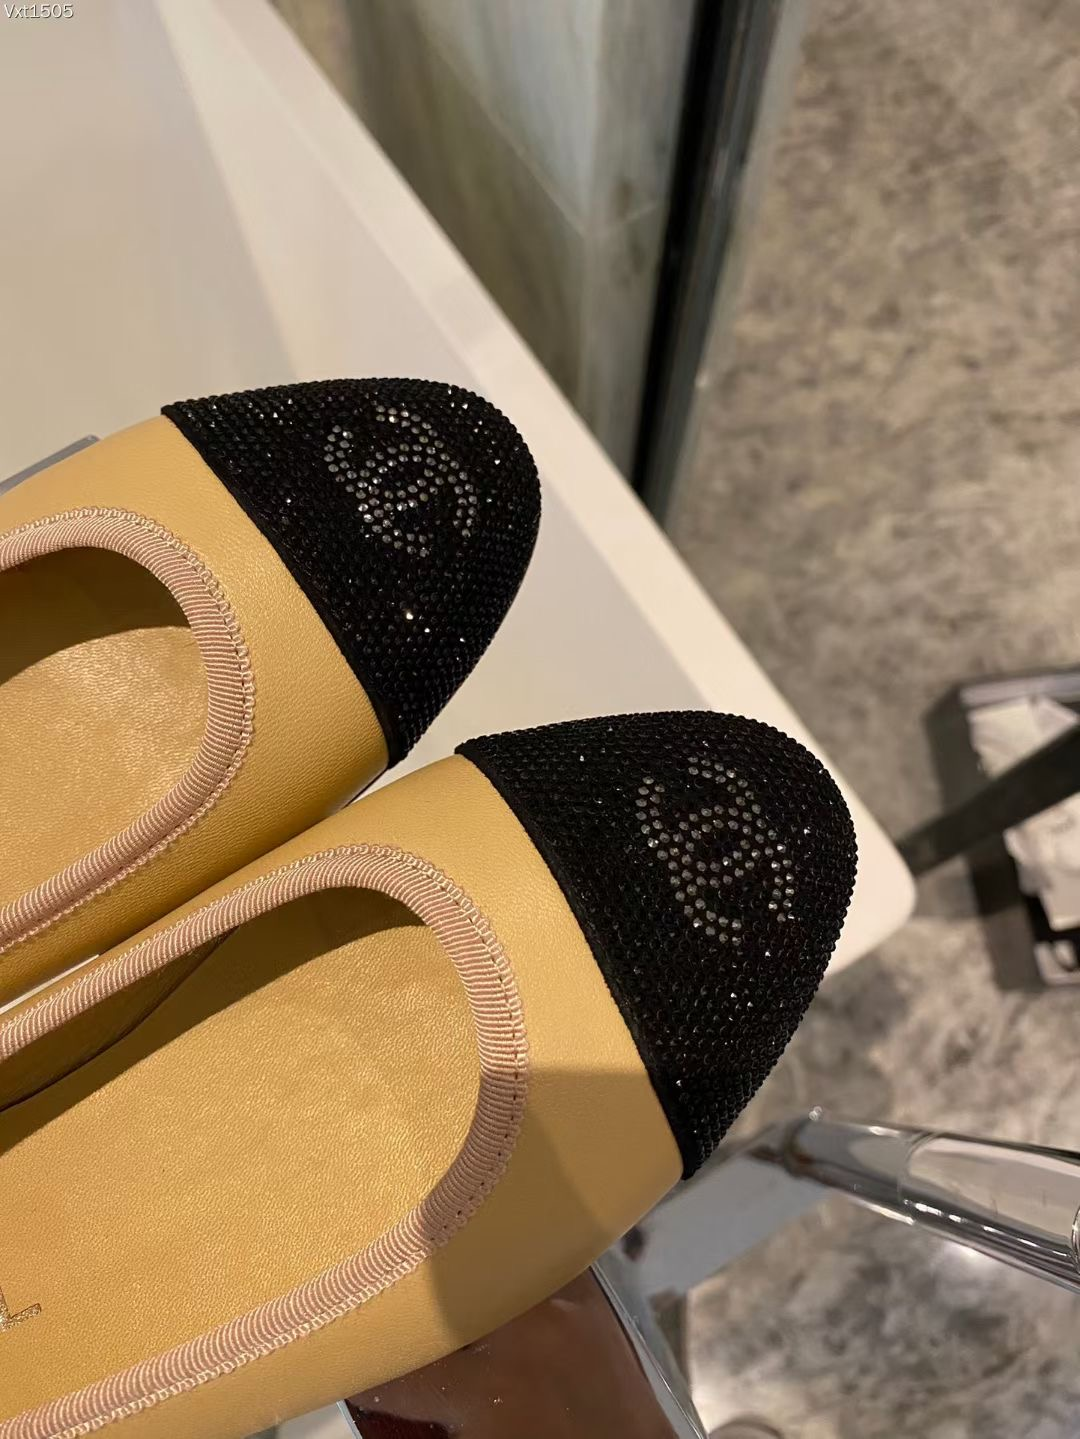 Chanel Балетки натуральная кожа